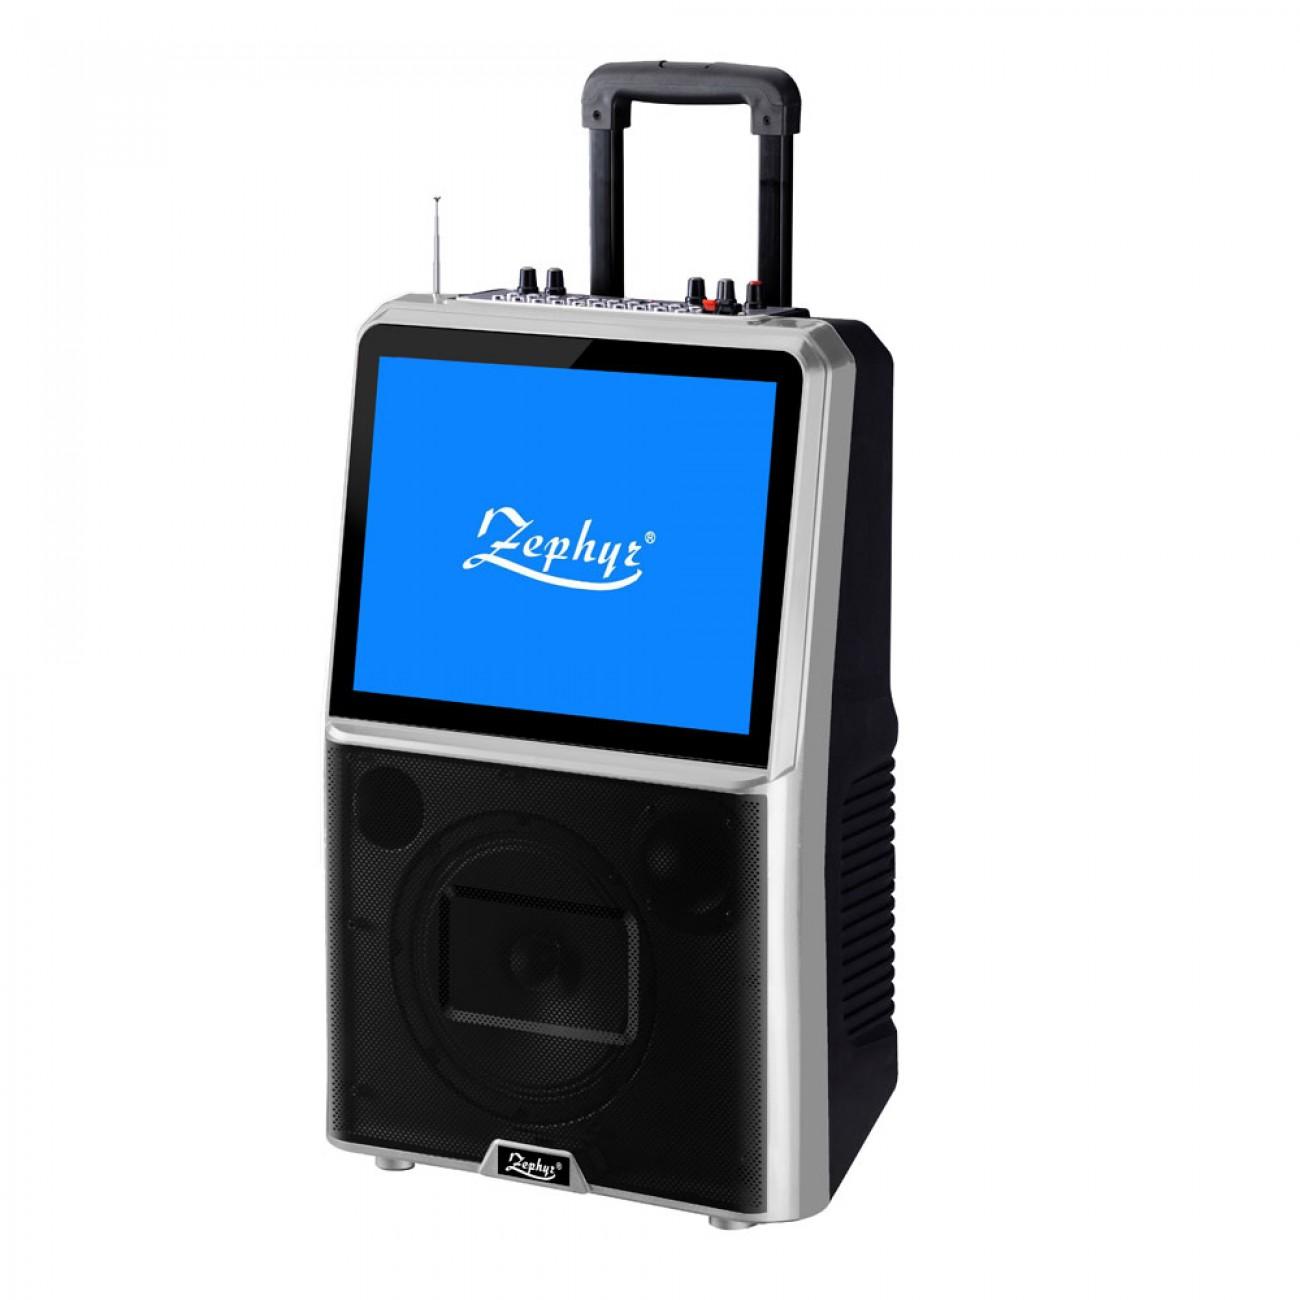 Караоке тонколона с цветен LED екран Zephyr ZP 9999 ETV, 8 TV тунер, Активна, Bluetooth, MP3, 2 бр. безжични микрофона, 12V/4.5Ah, Черен в Преносими караоке тонколони - ZEPHYR | Alleop